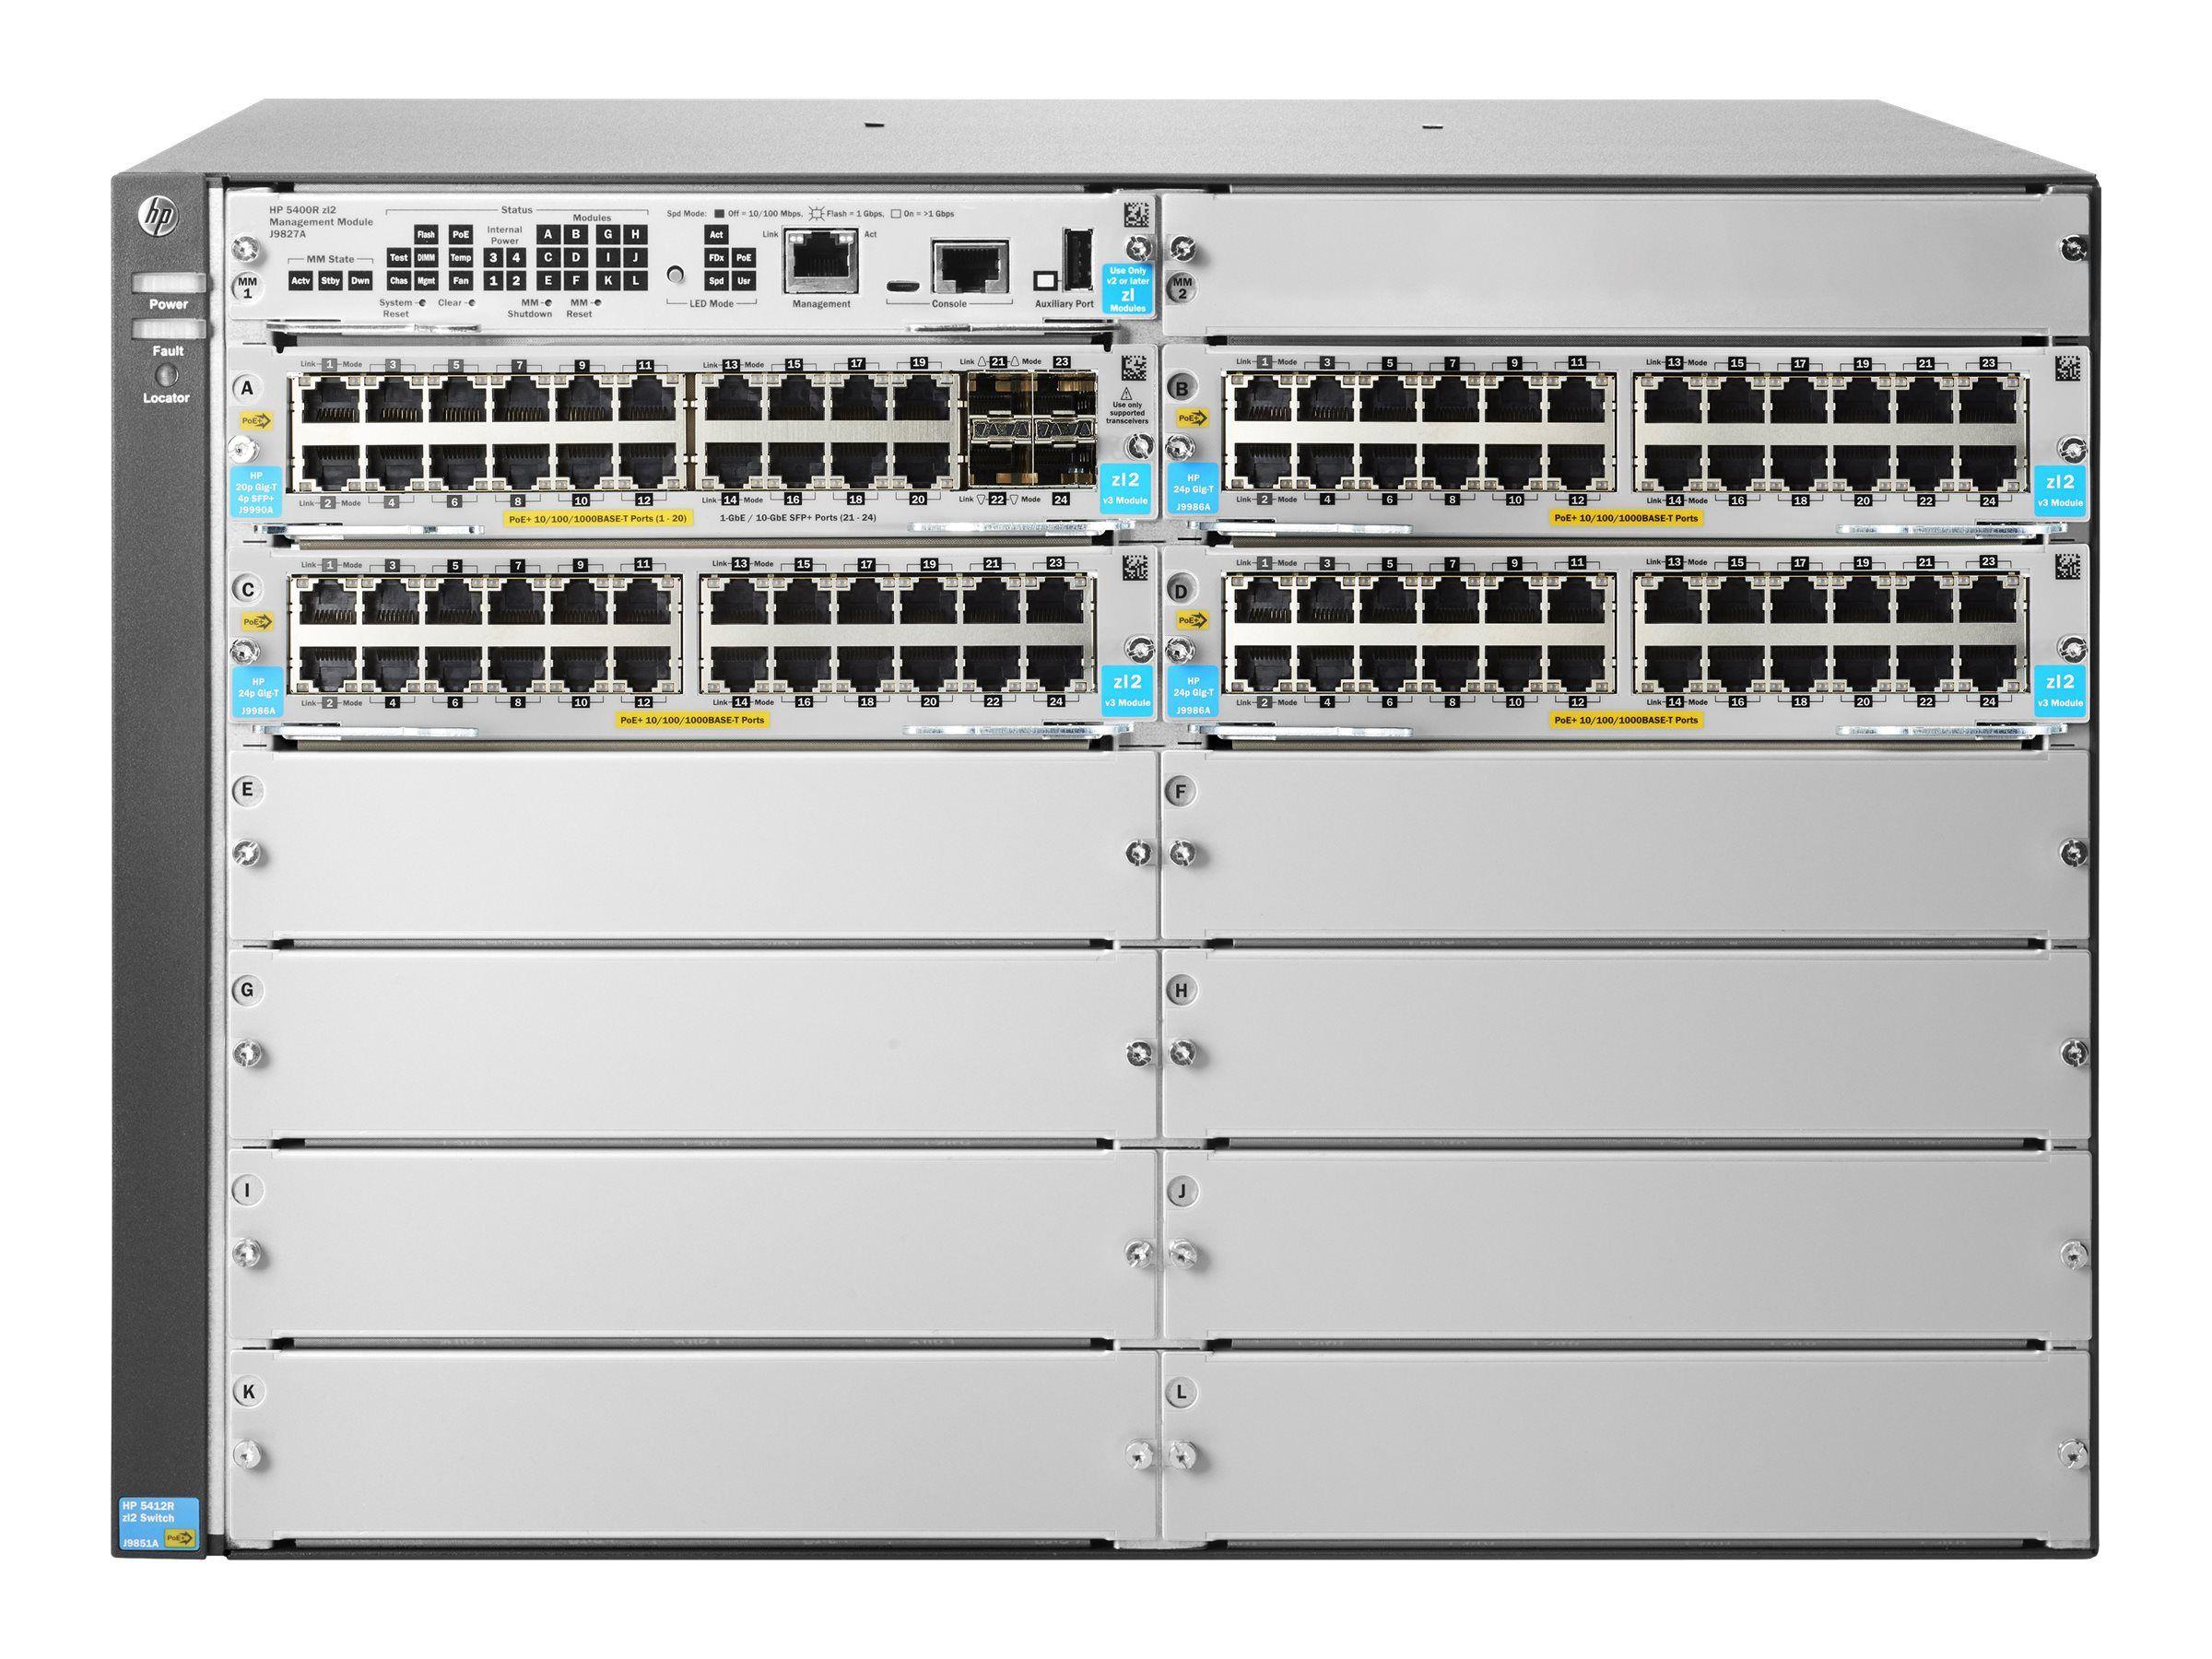 Aruba 5412R 92GT PoE+ 4SFP+ v3 zl2 Switch - managed